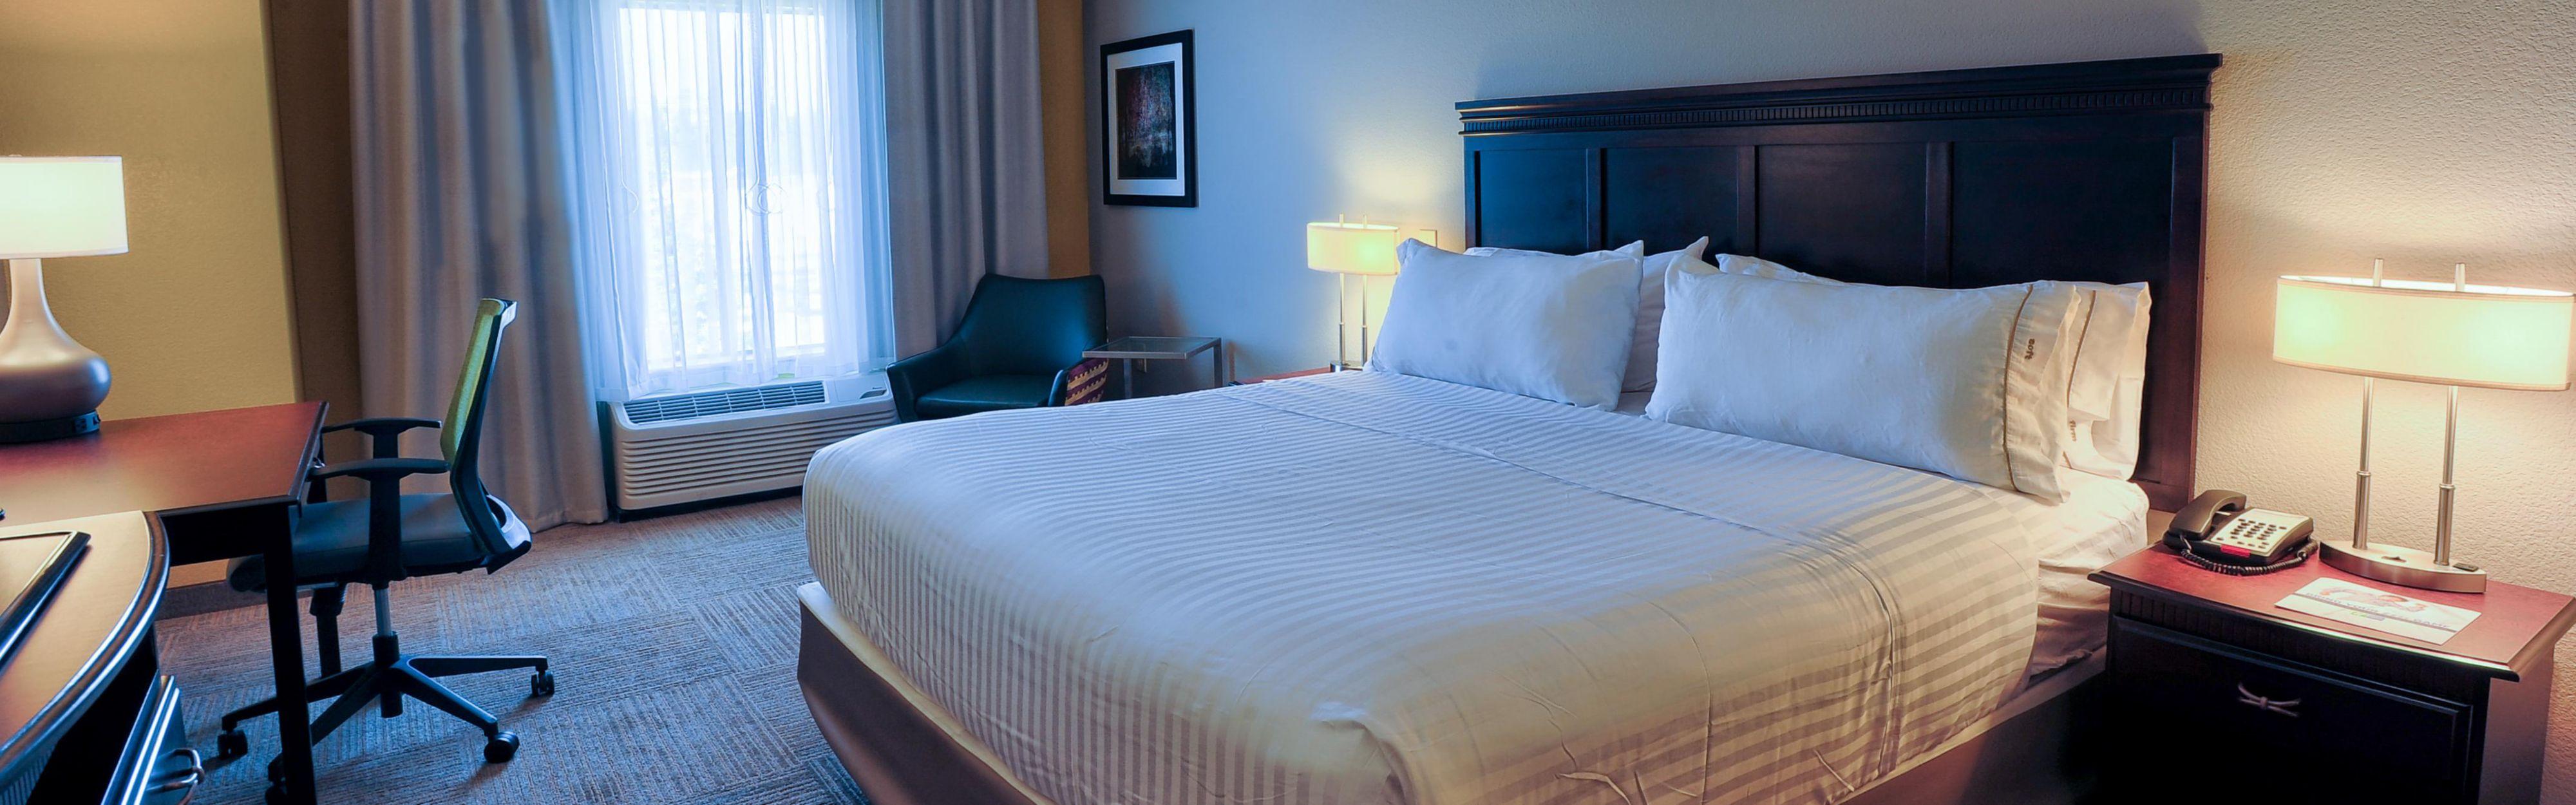 Holiday Inn Express Pell City image 1